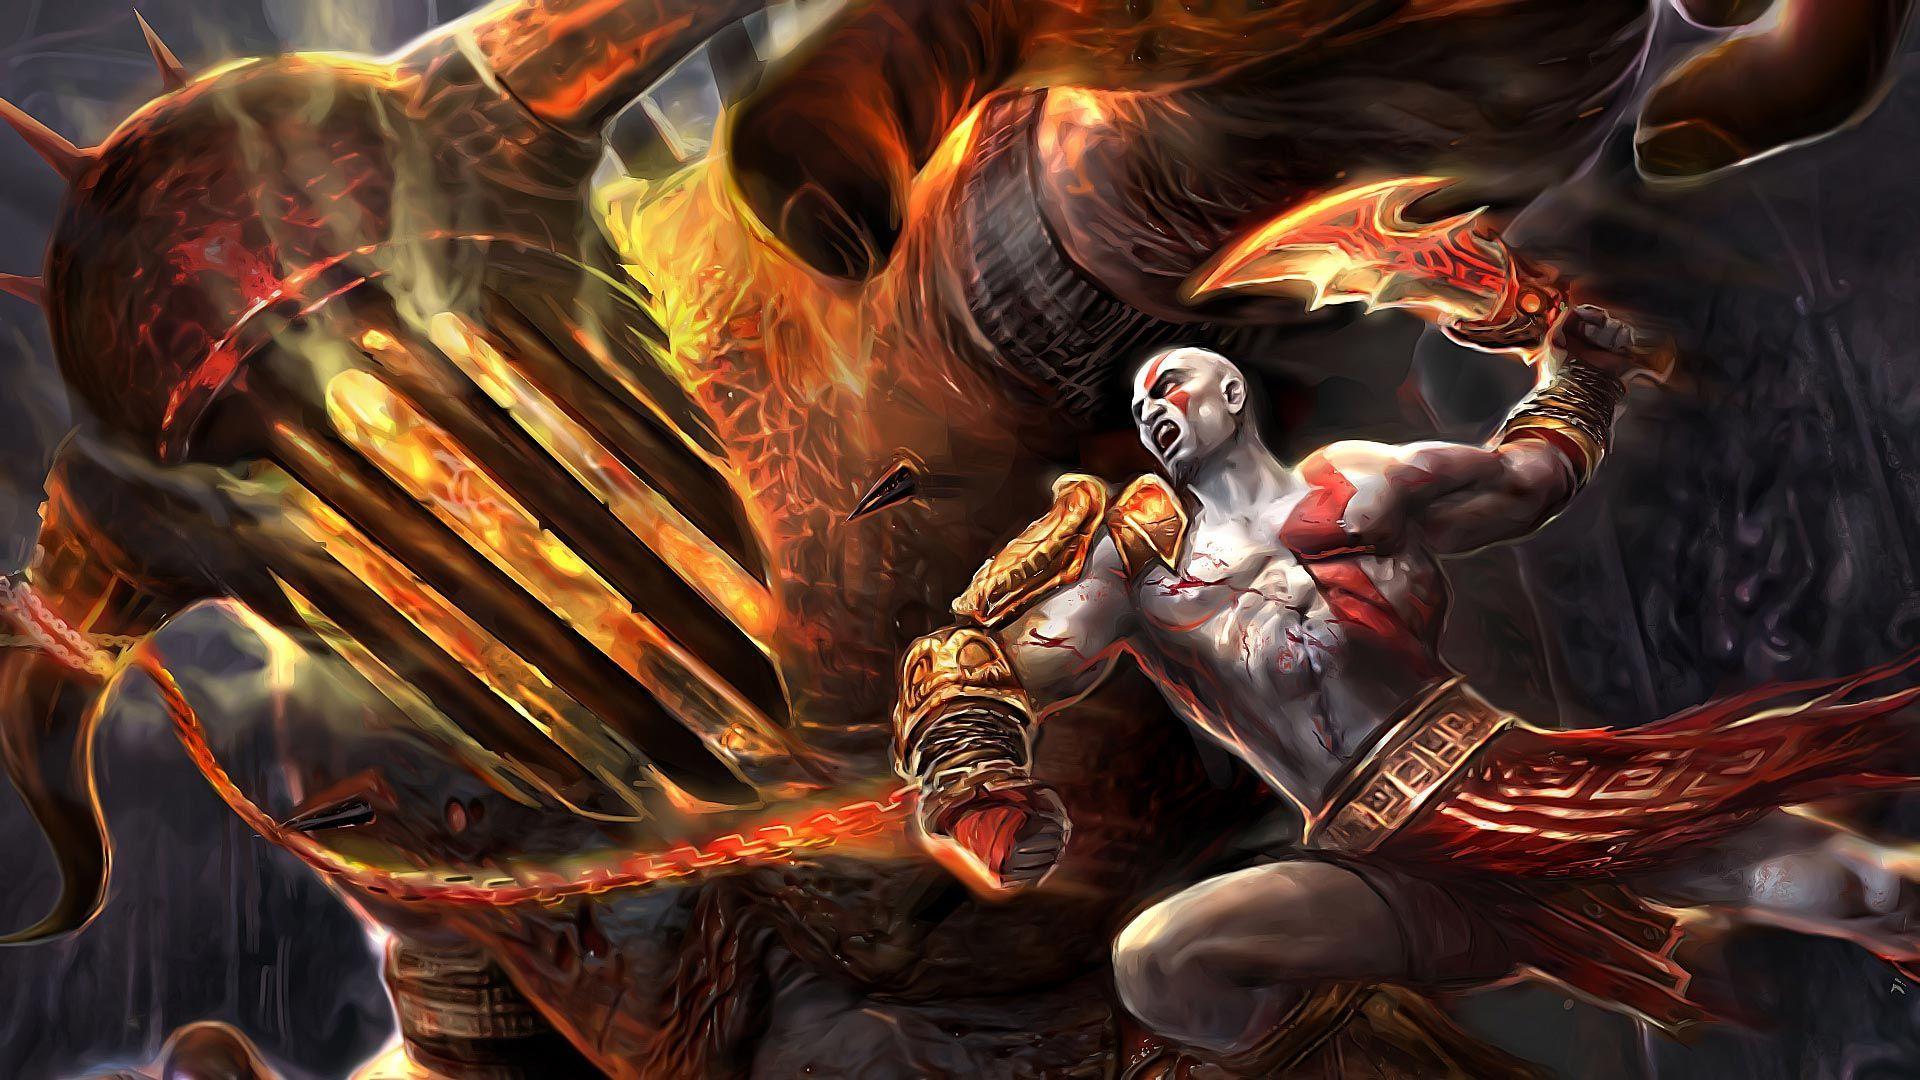 Kratos God Of War Wallpapers 36 Wallpapers Adorable Wallpapers